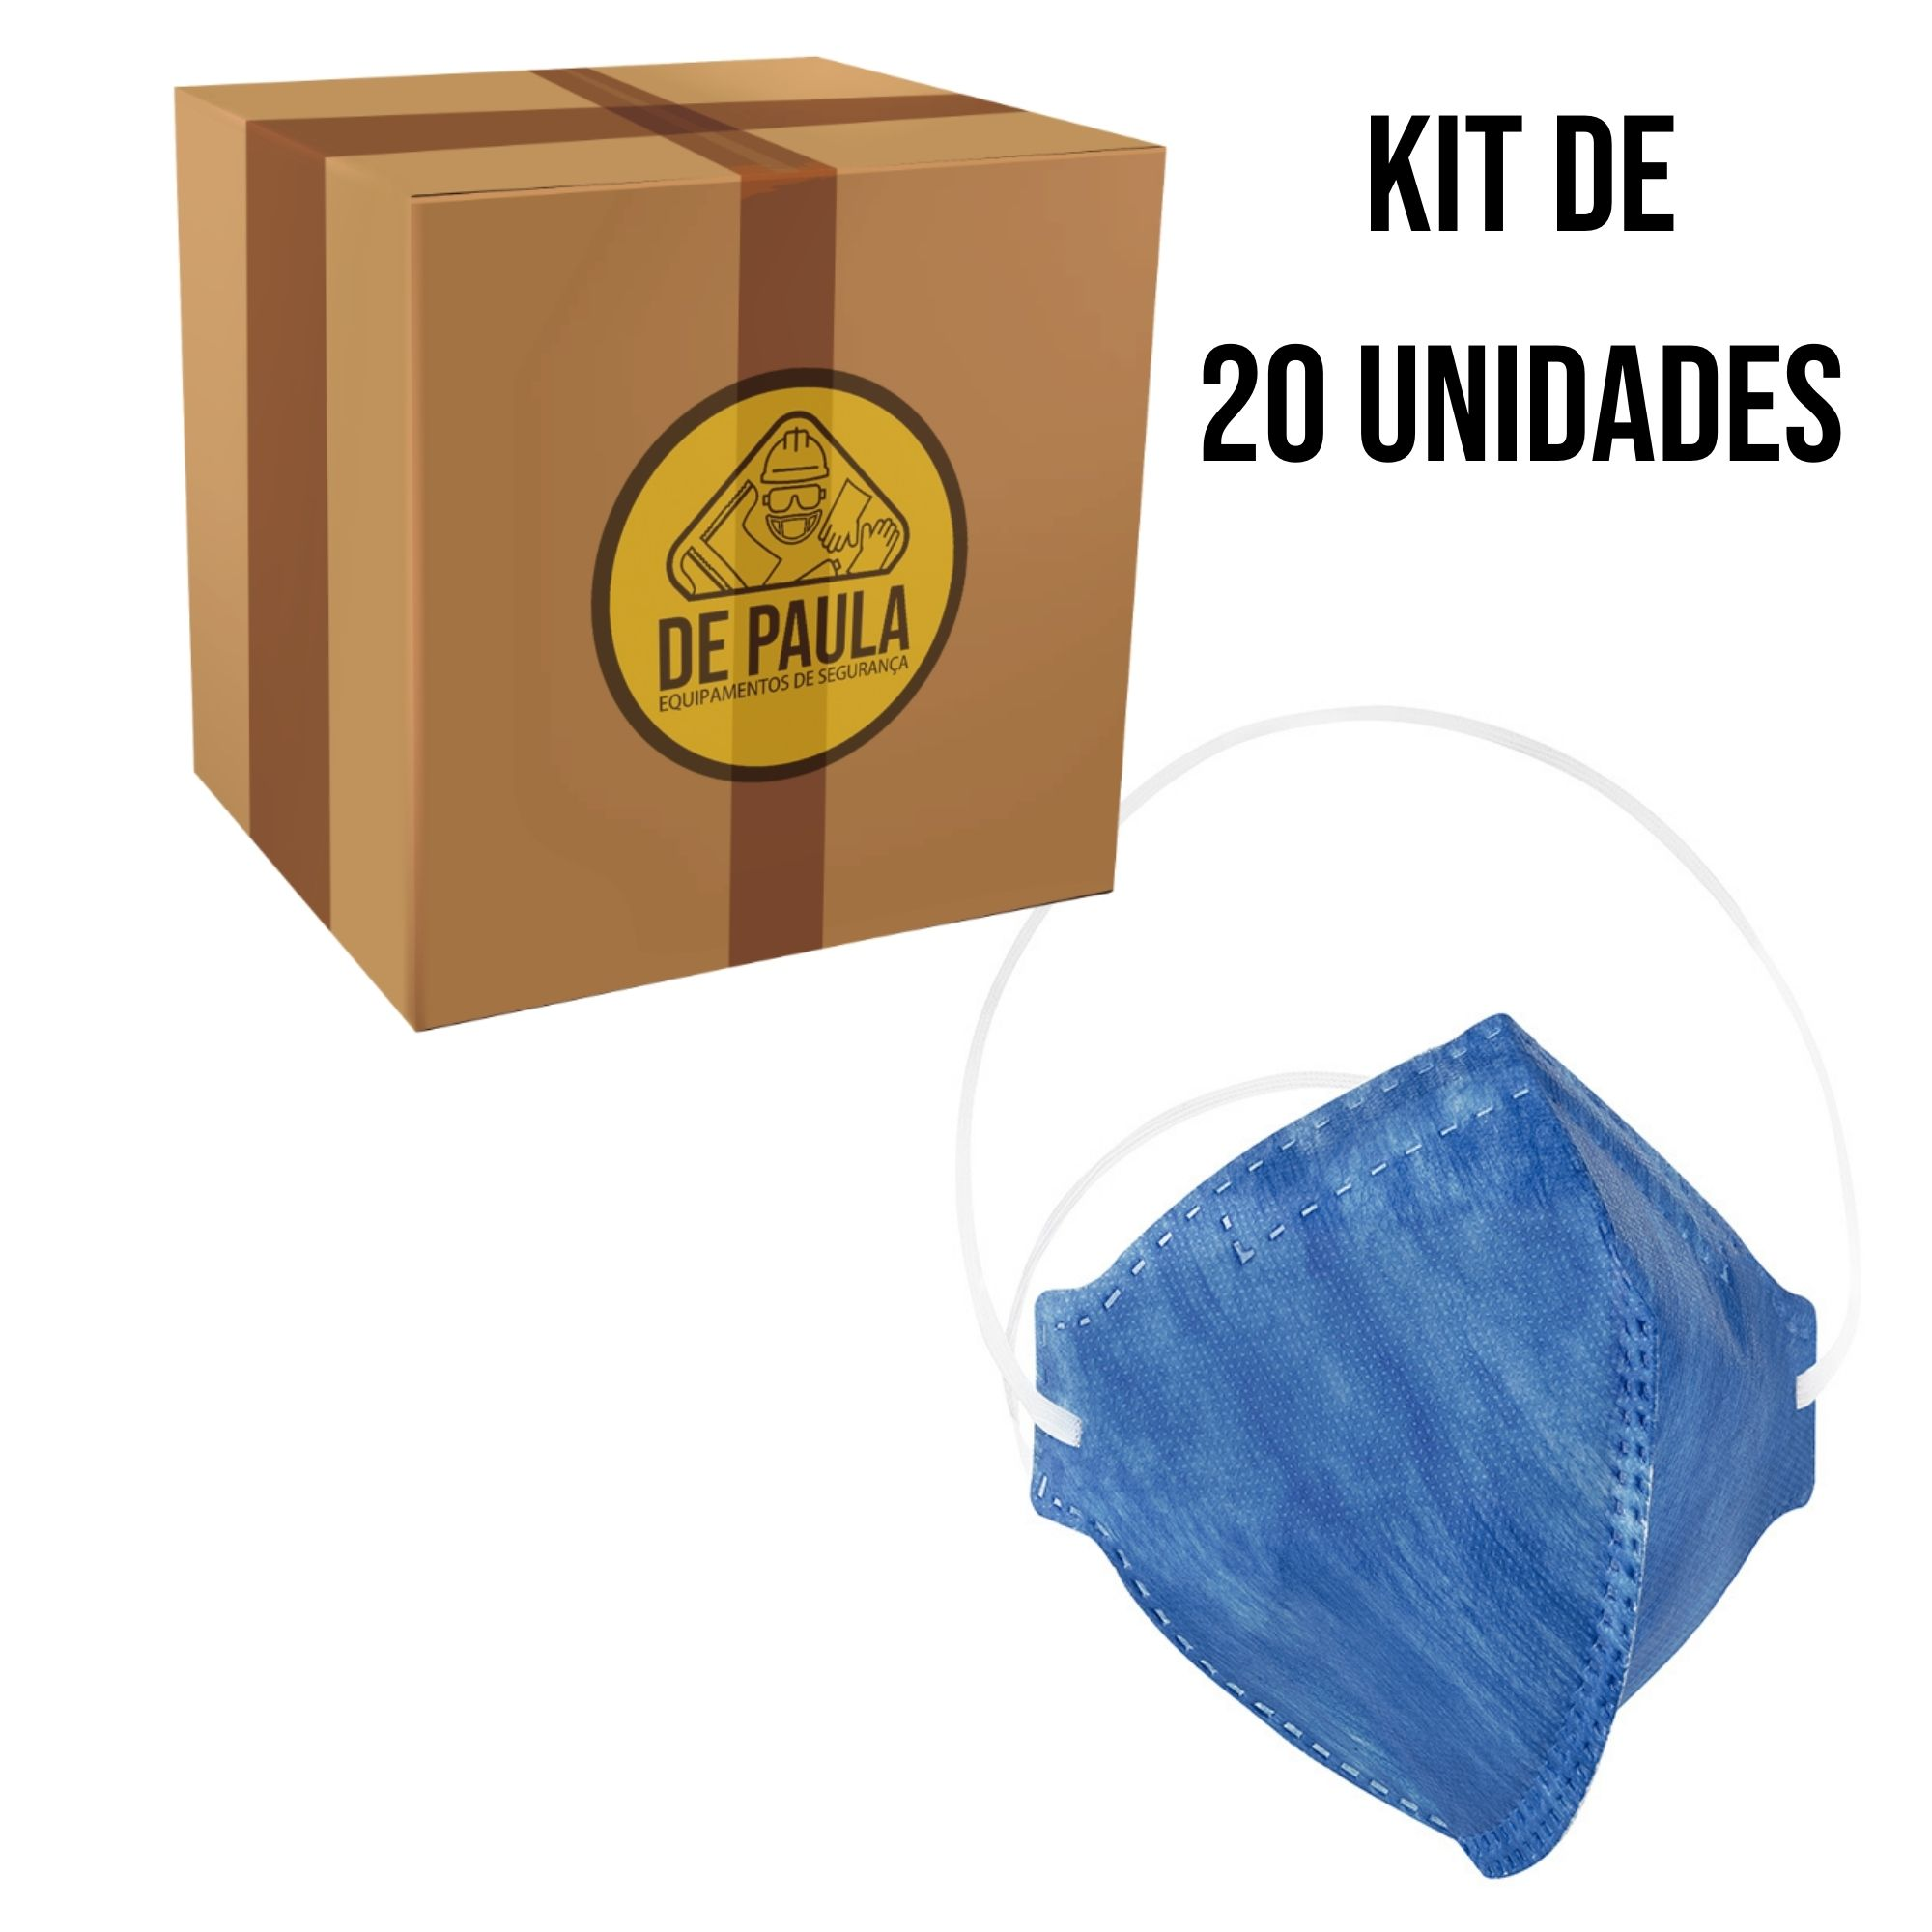 Kit de 20 unidades de Mascara Descartável Pff2-Pro Agro sem válvula - Delta Plus  - DE PAULA EPI